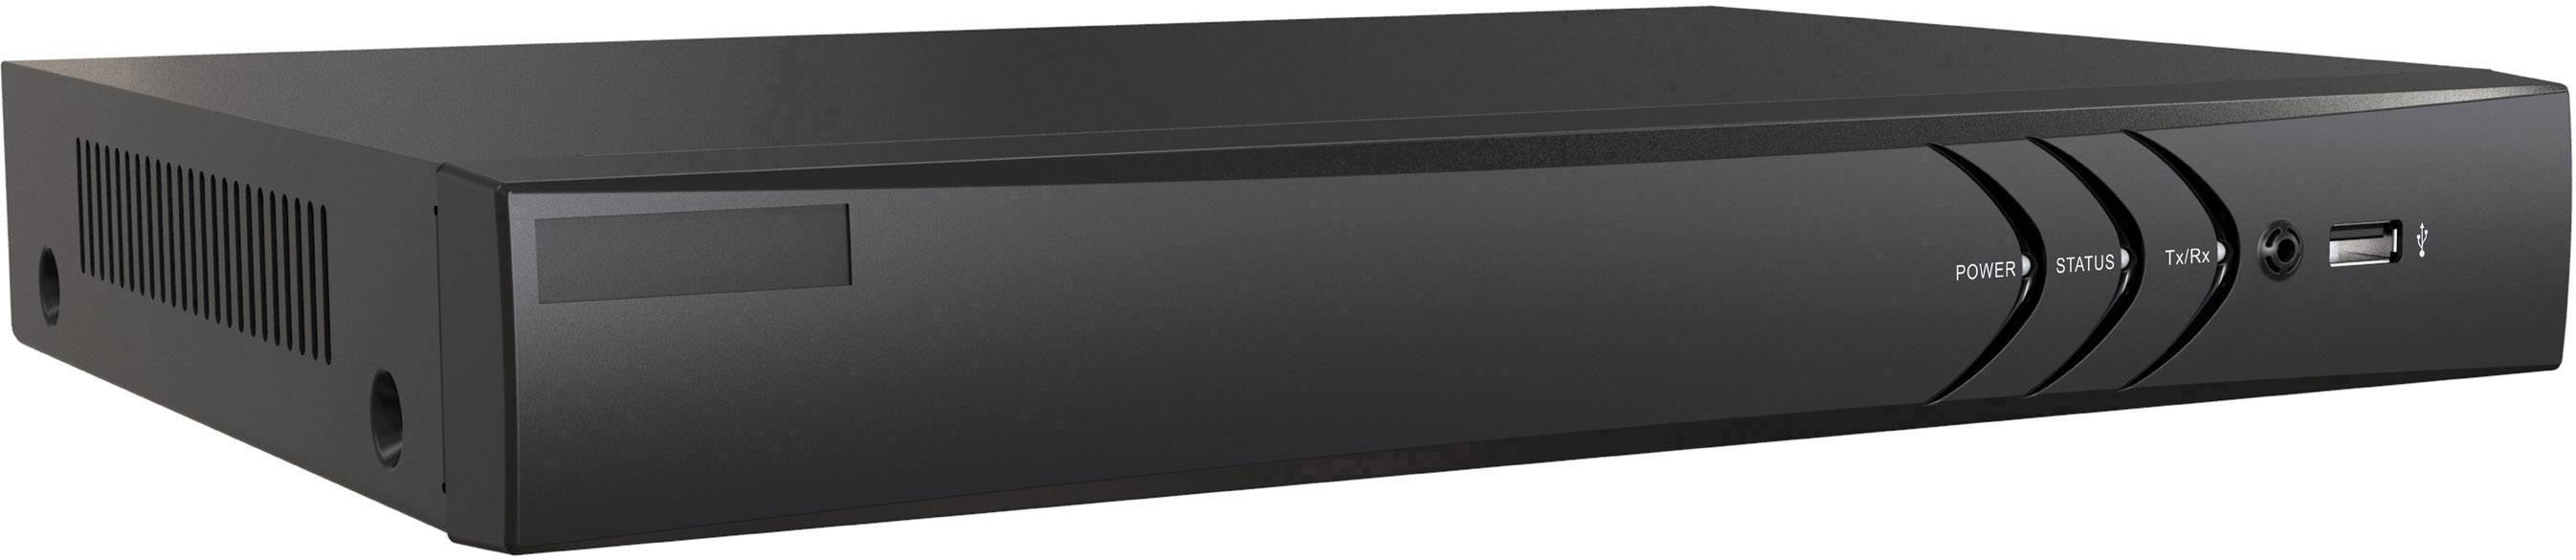 Digitálny videorekordér HiWatch DS-H204U DS-H204U, 4-kanálový